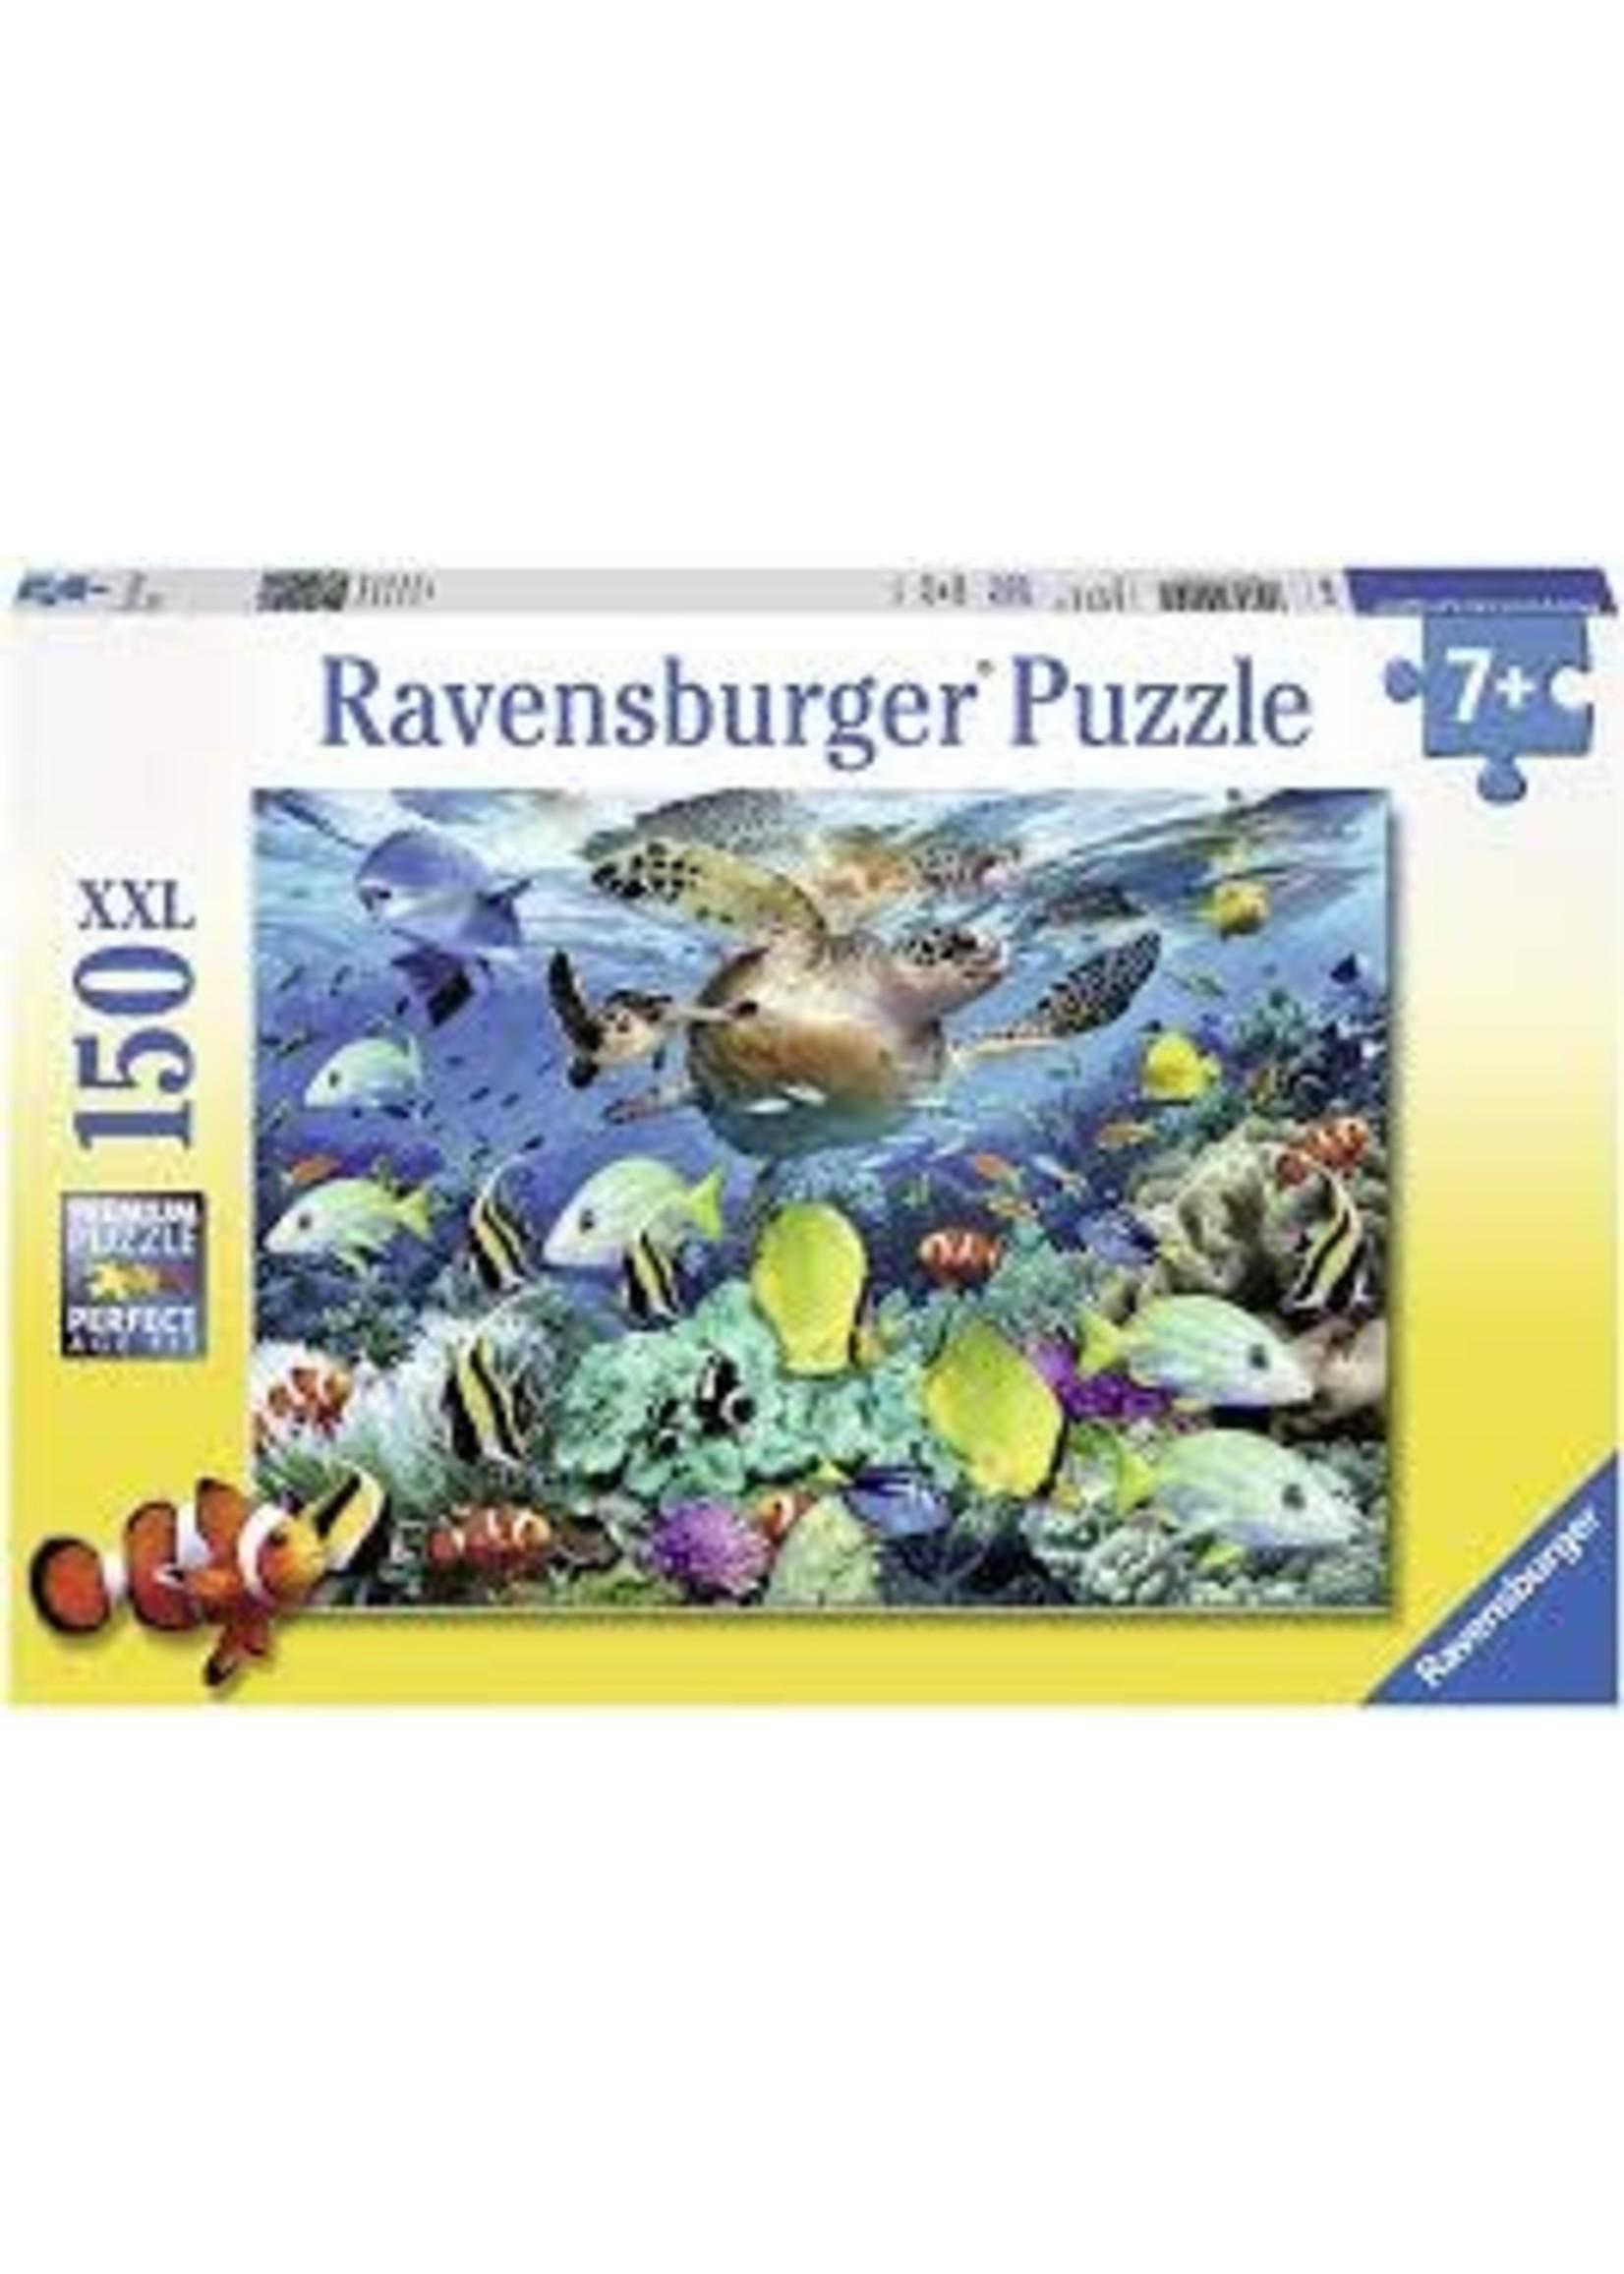 Ravensburger 150pc XXL puzzle Underwater Paradise